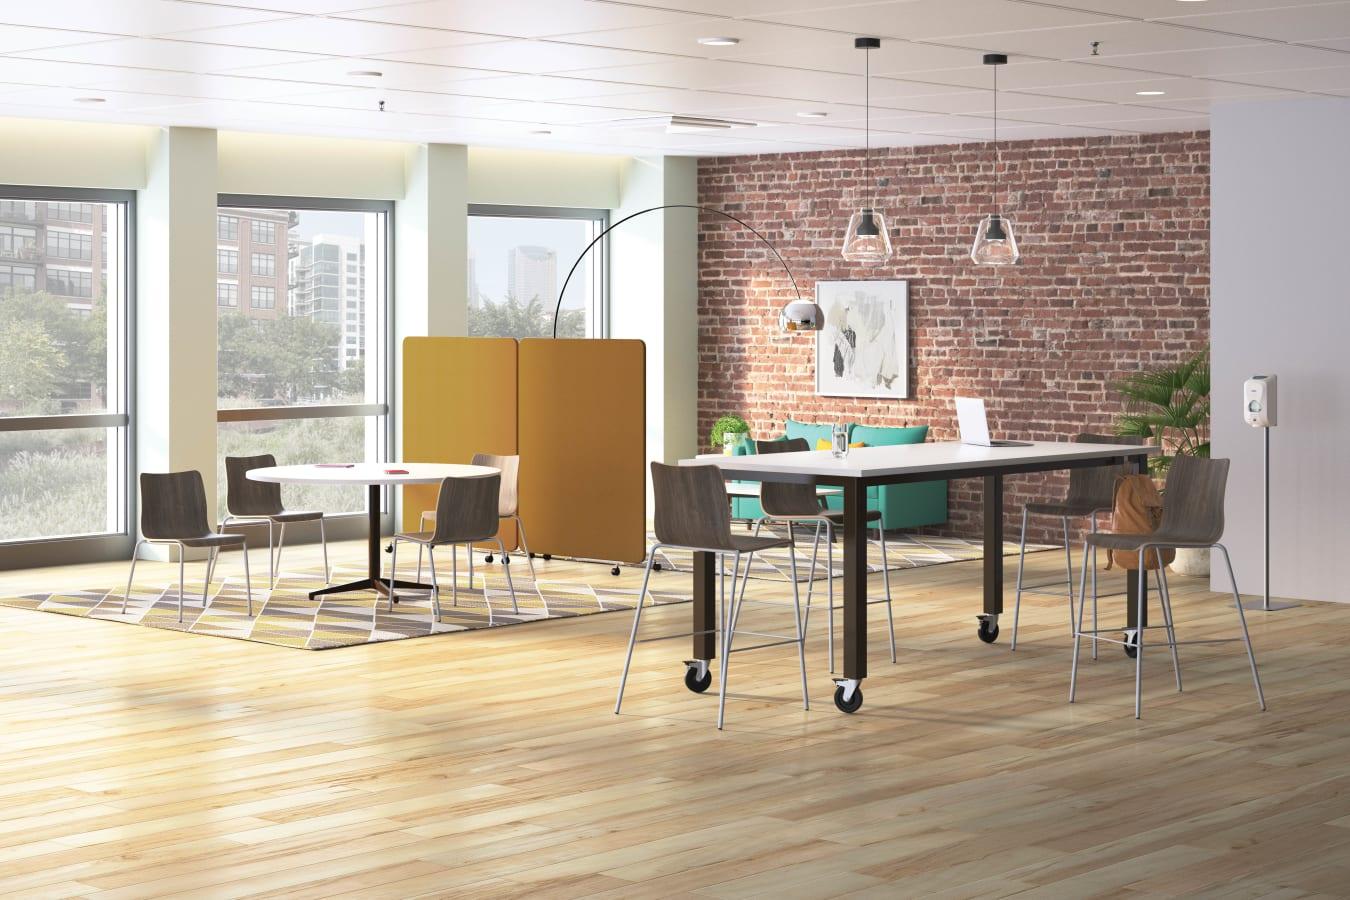 HON/Chairs/Ruck/HON-Ruck-Preside-500-002